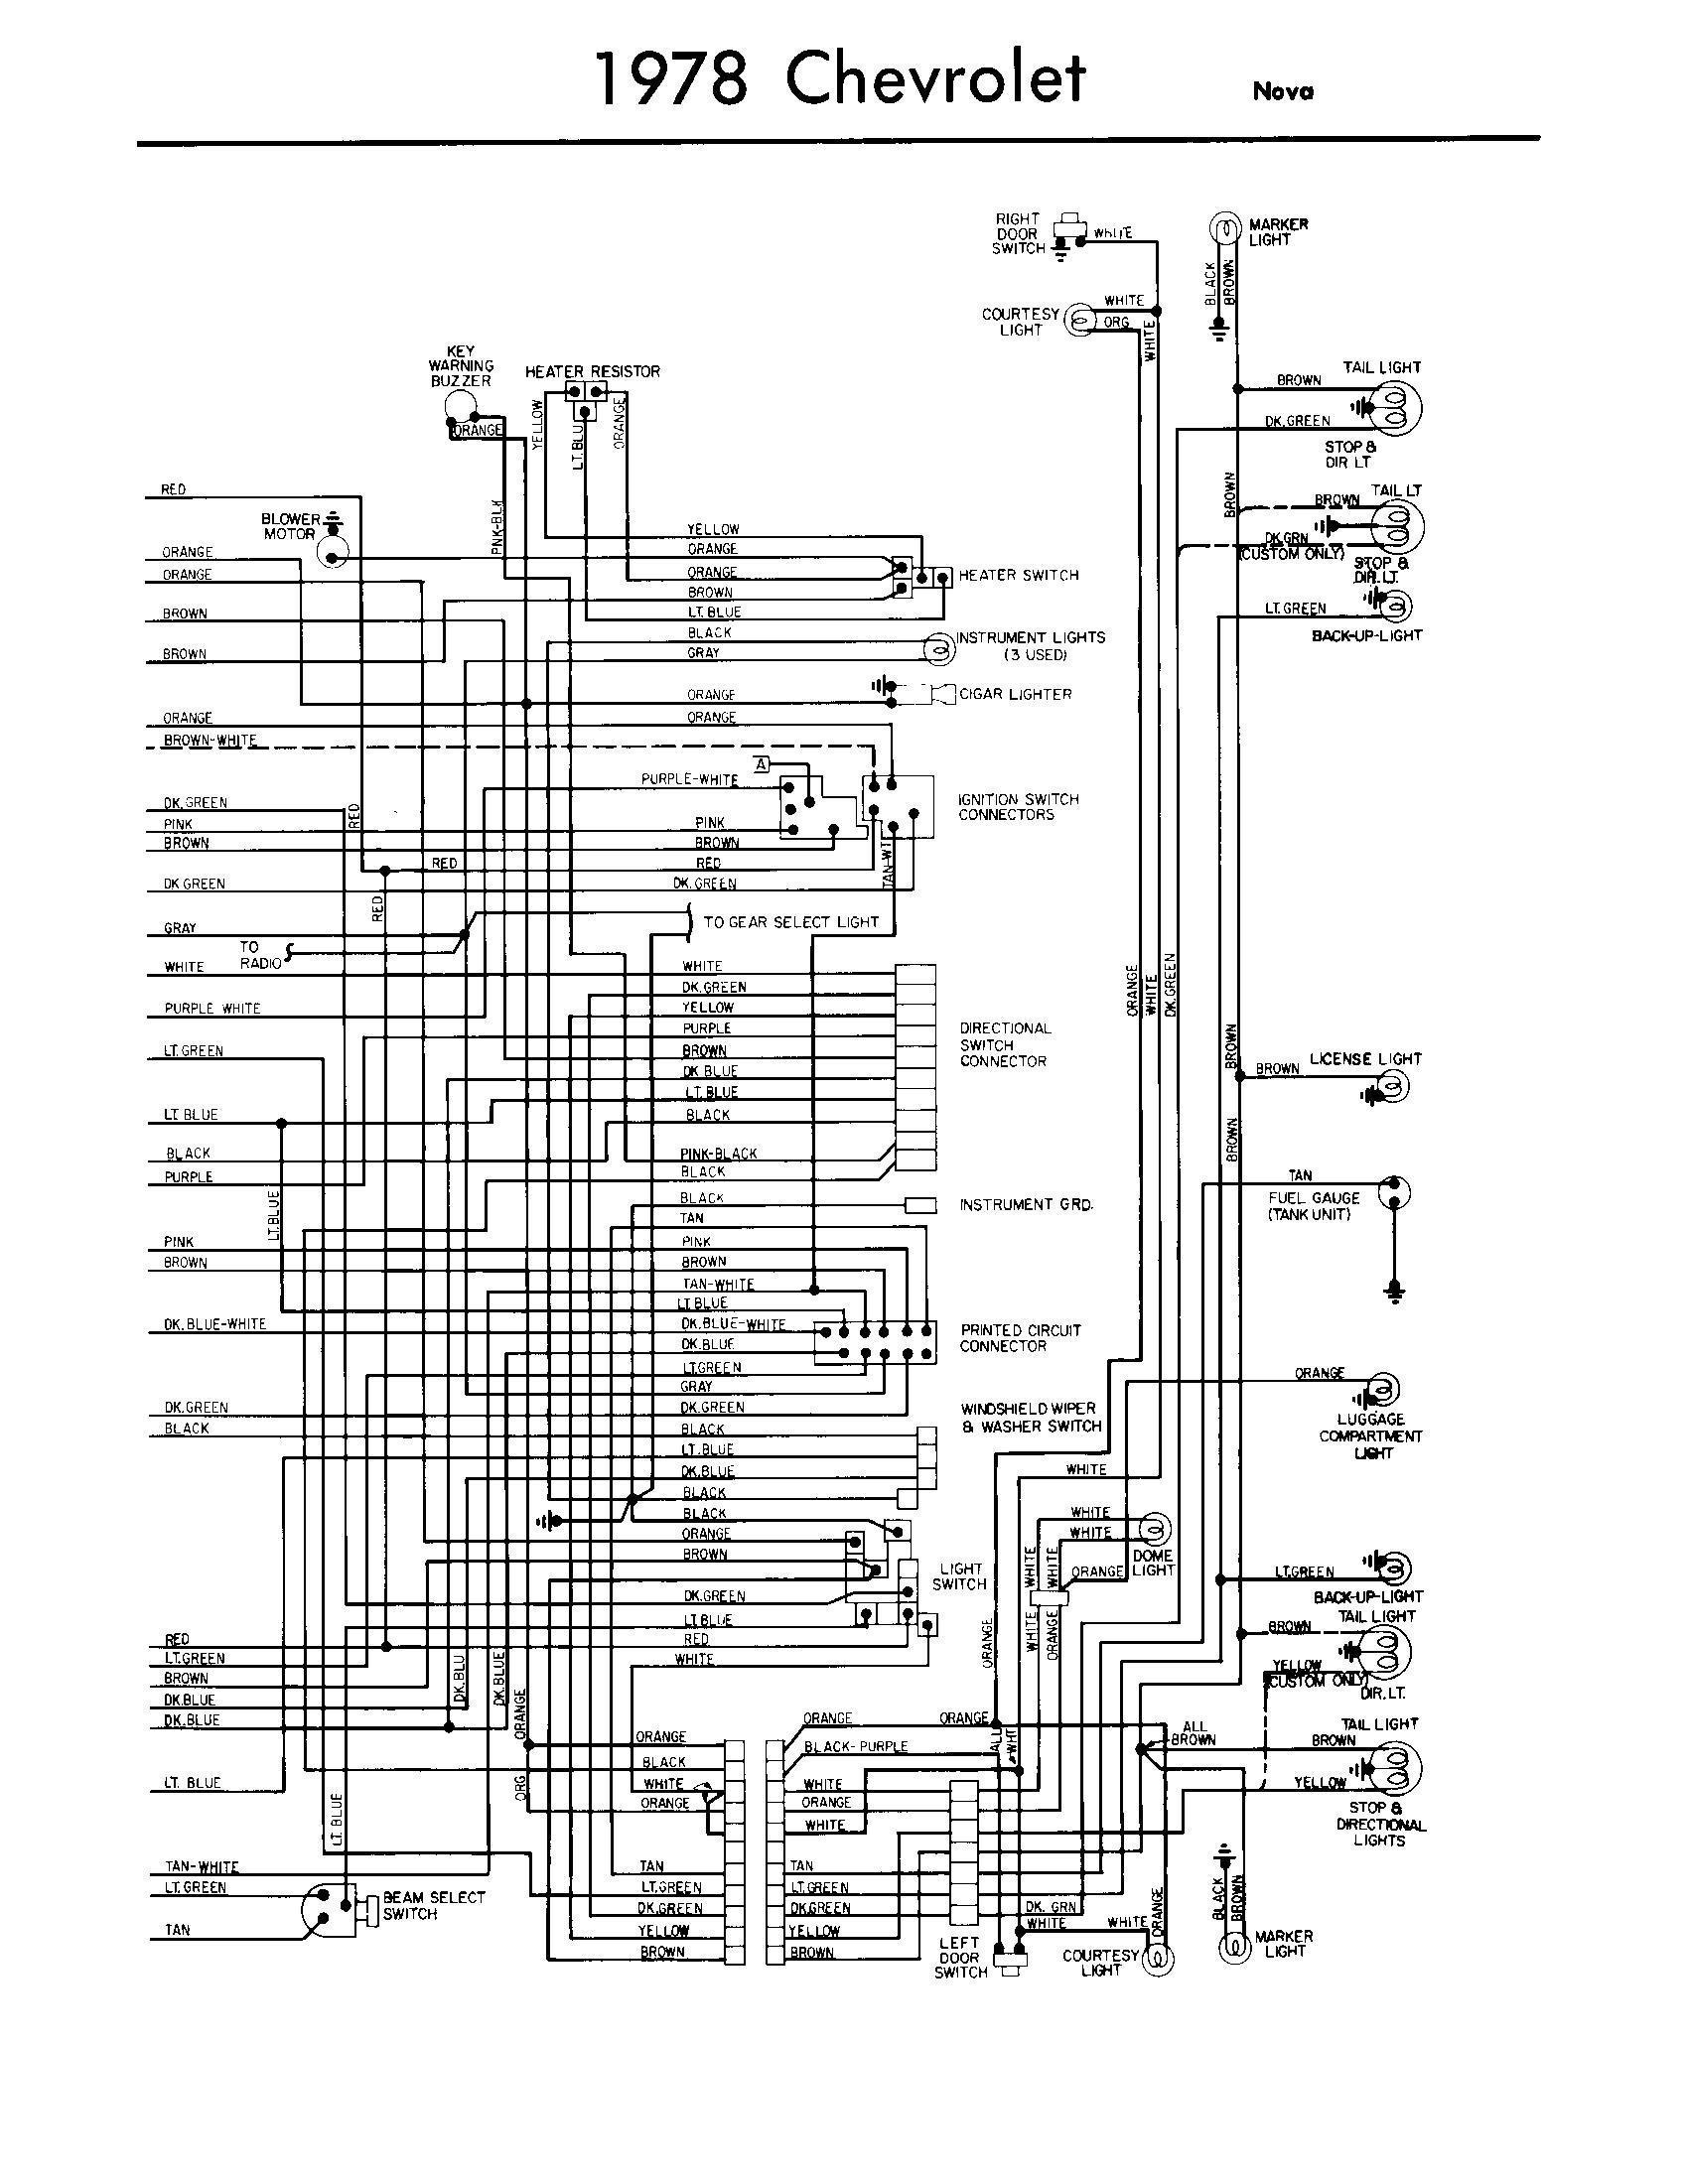 Remarkable 78 Chevy C10 Gauge Wiring Today Diagram Data Schema Wiring Cloud Timewinrebemohammedshrineorg